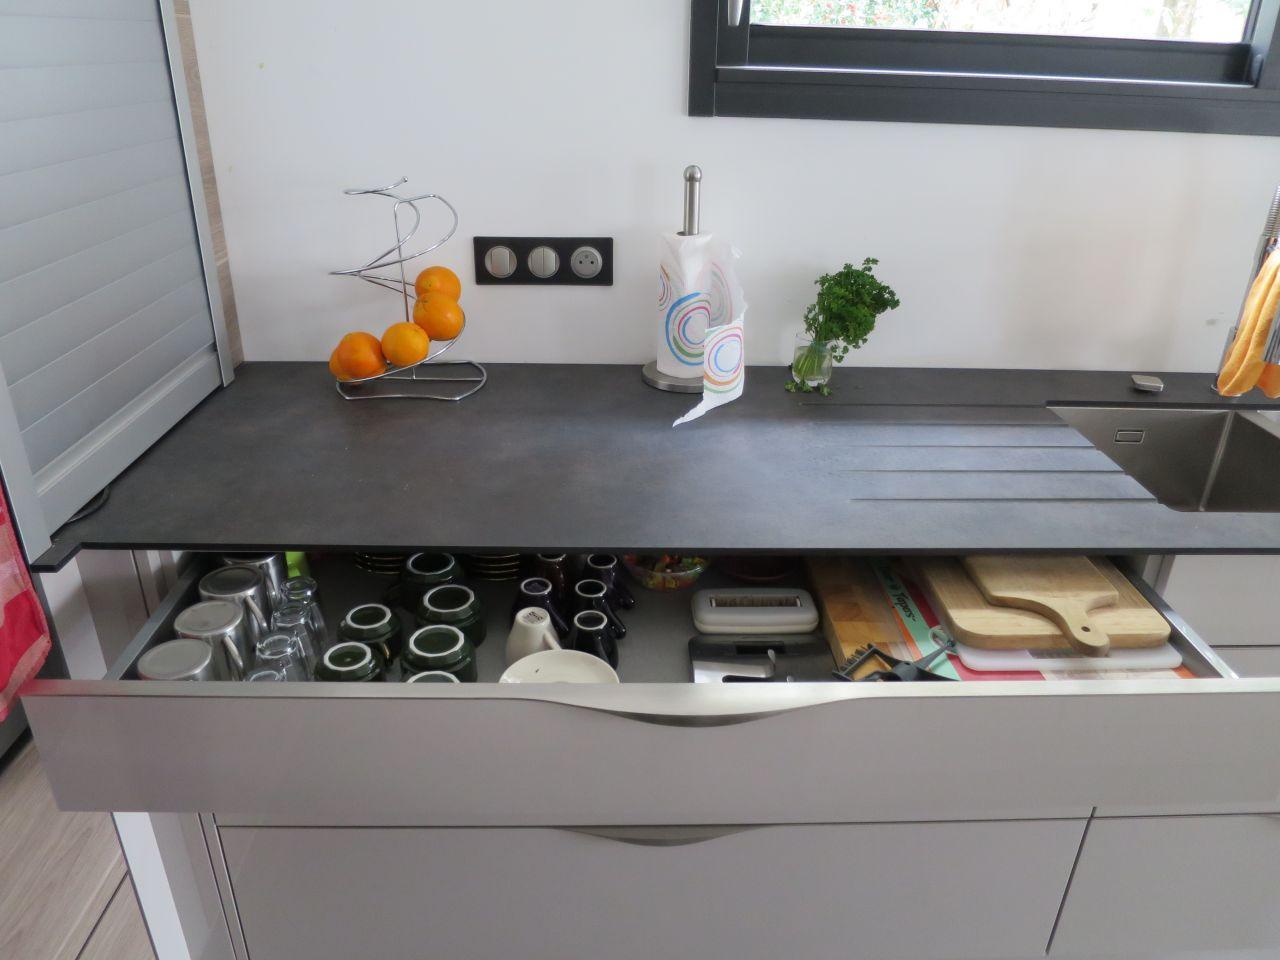 gros plan sur la cuisine breuillet charente maritime. Black Bedroom Furniture Sets. Home Design Ideas